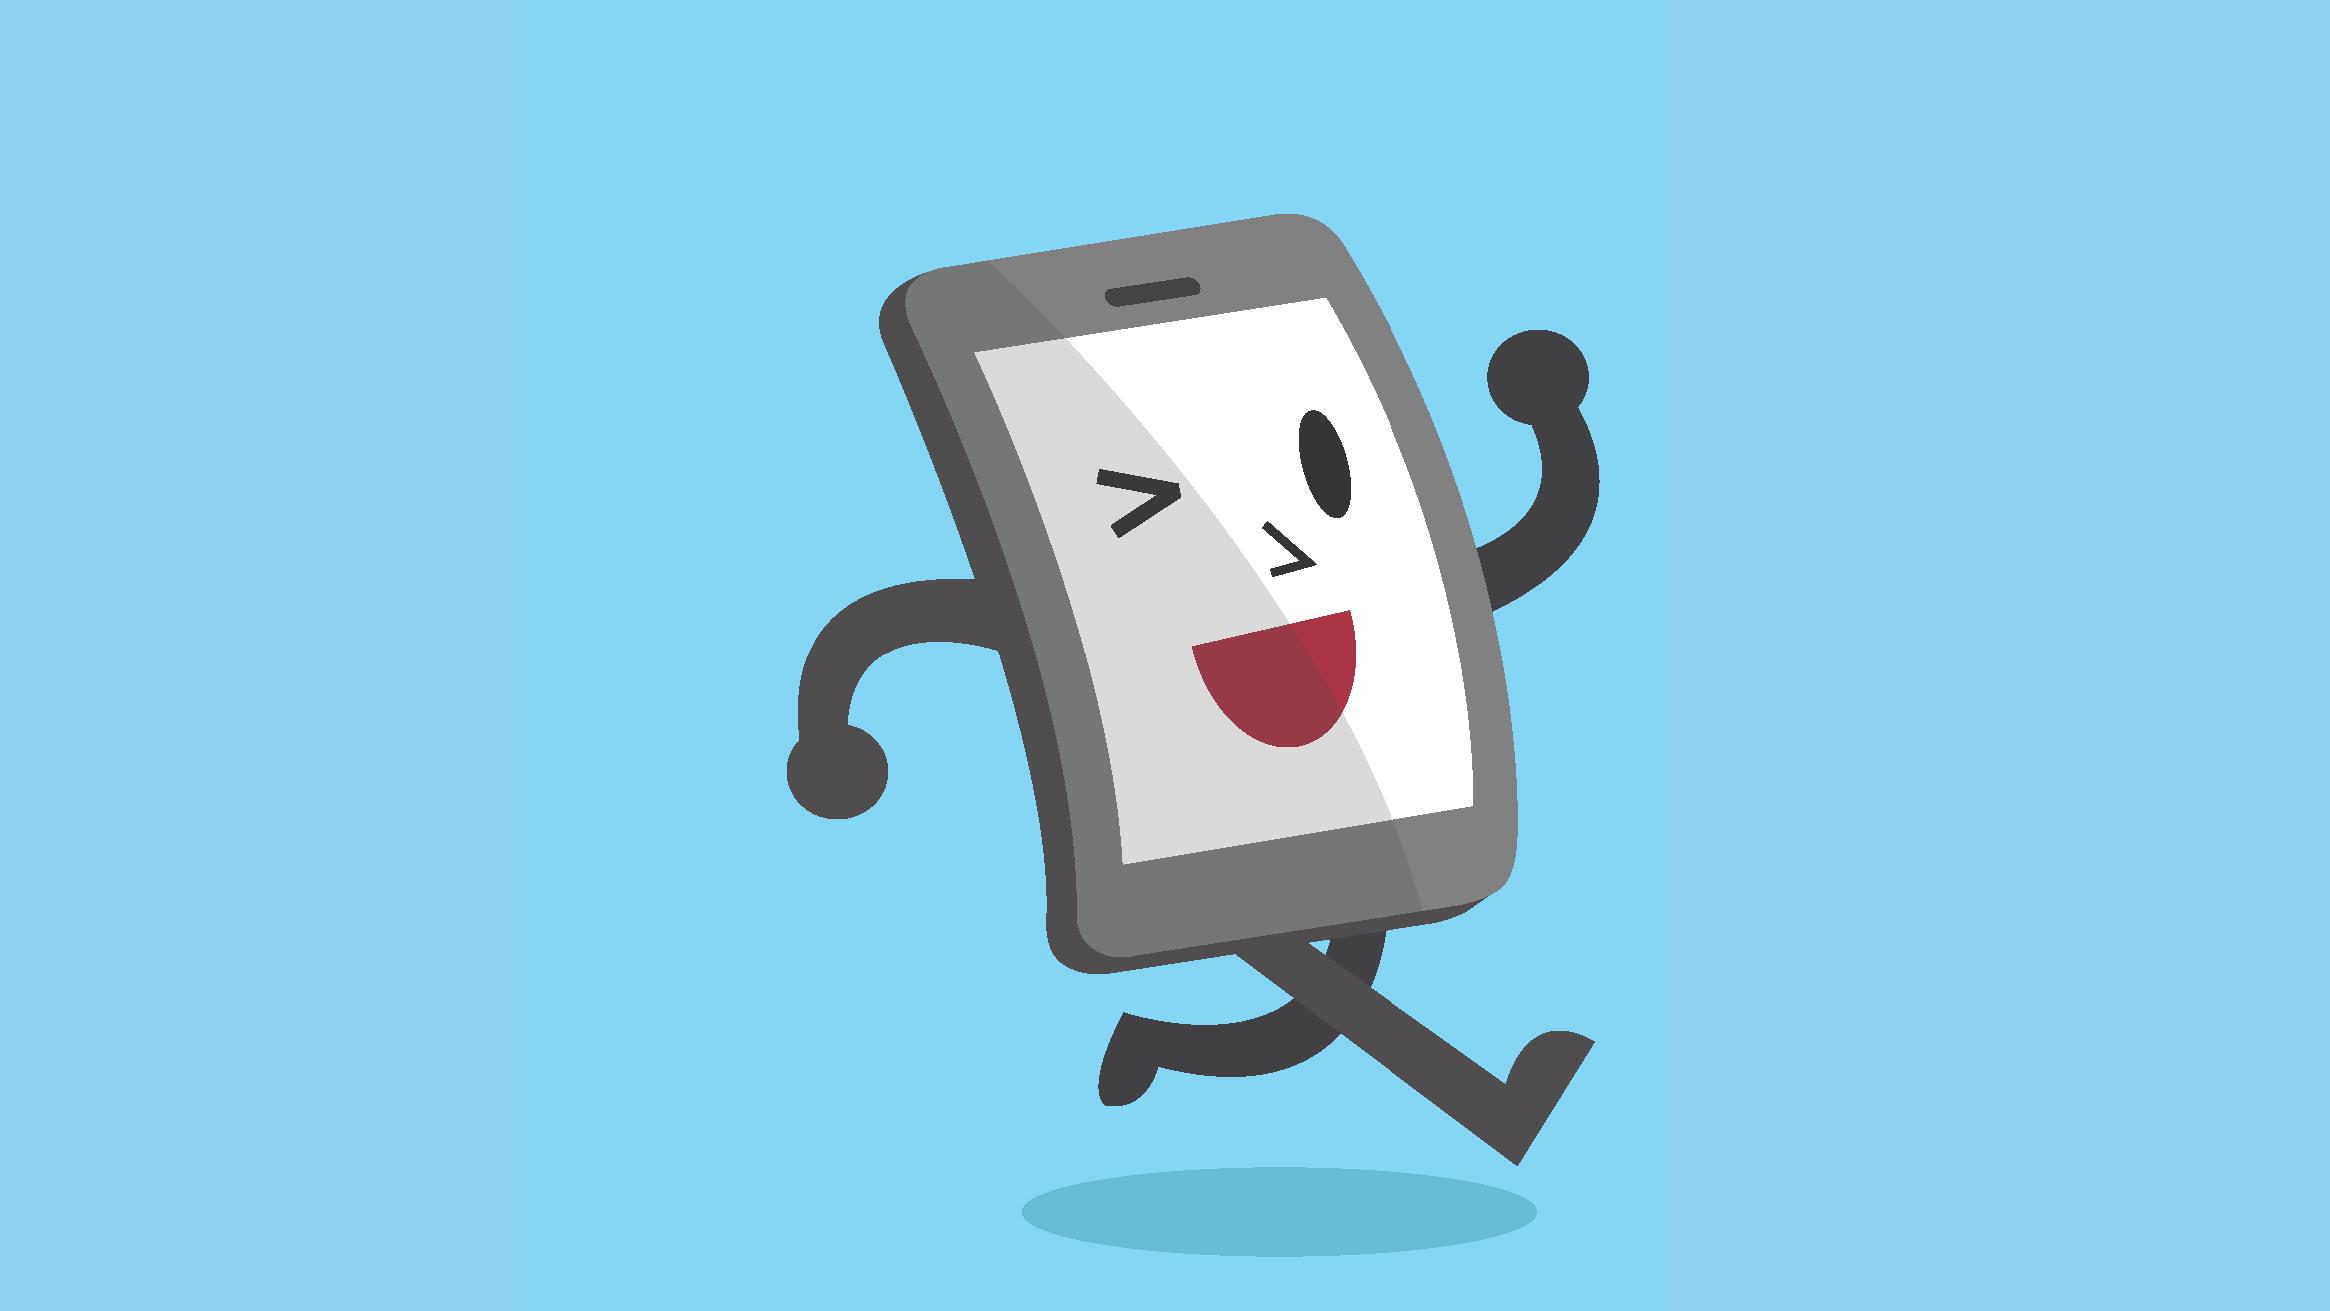 Ugxpyzwpq4uccbb1nsrj+animated_running_phone_with_wink_face